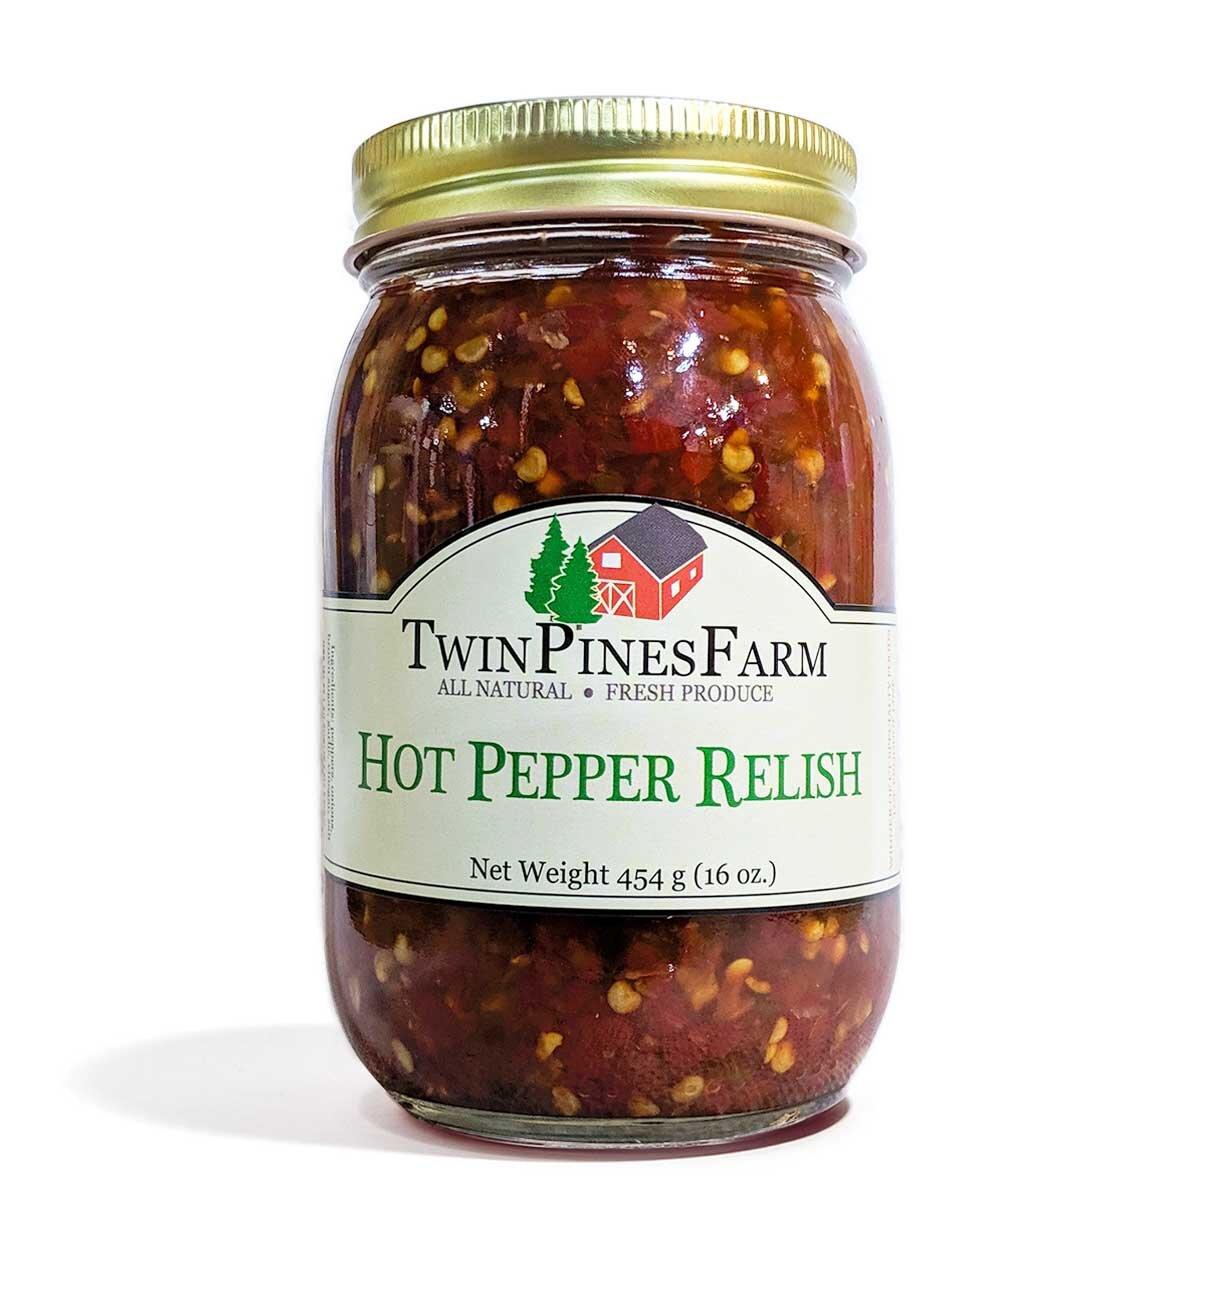 Hot Pepper Relish - $6.50